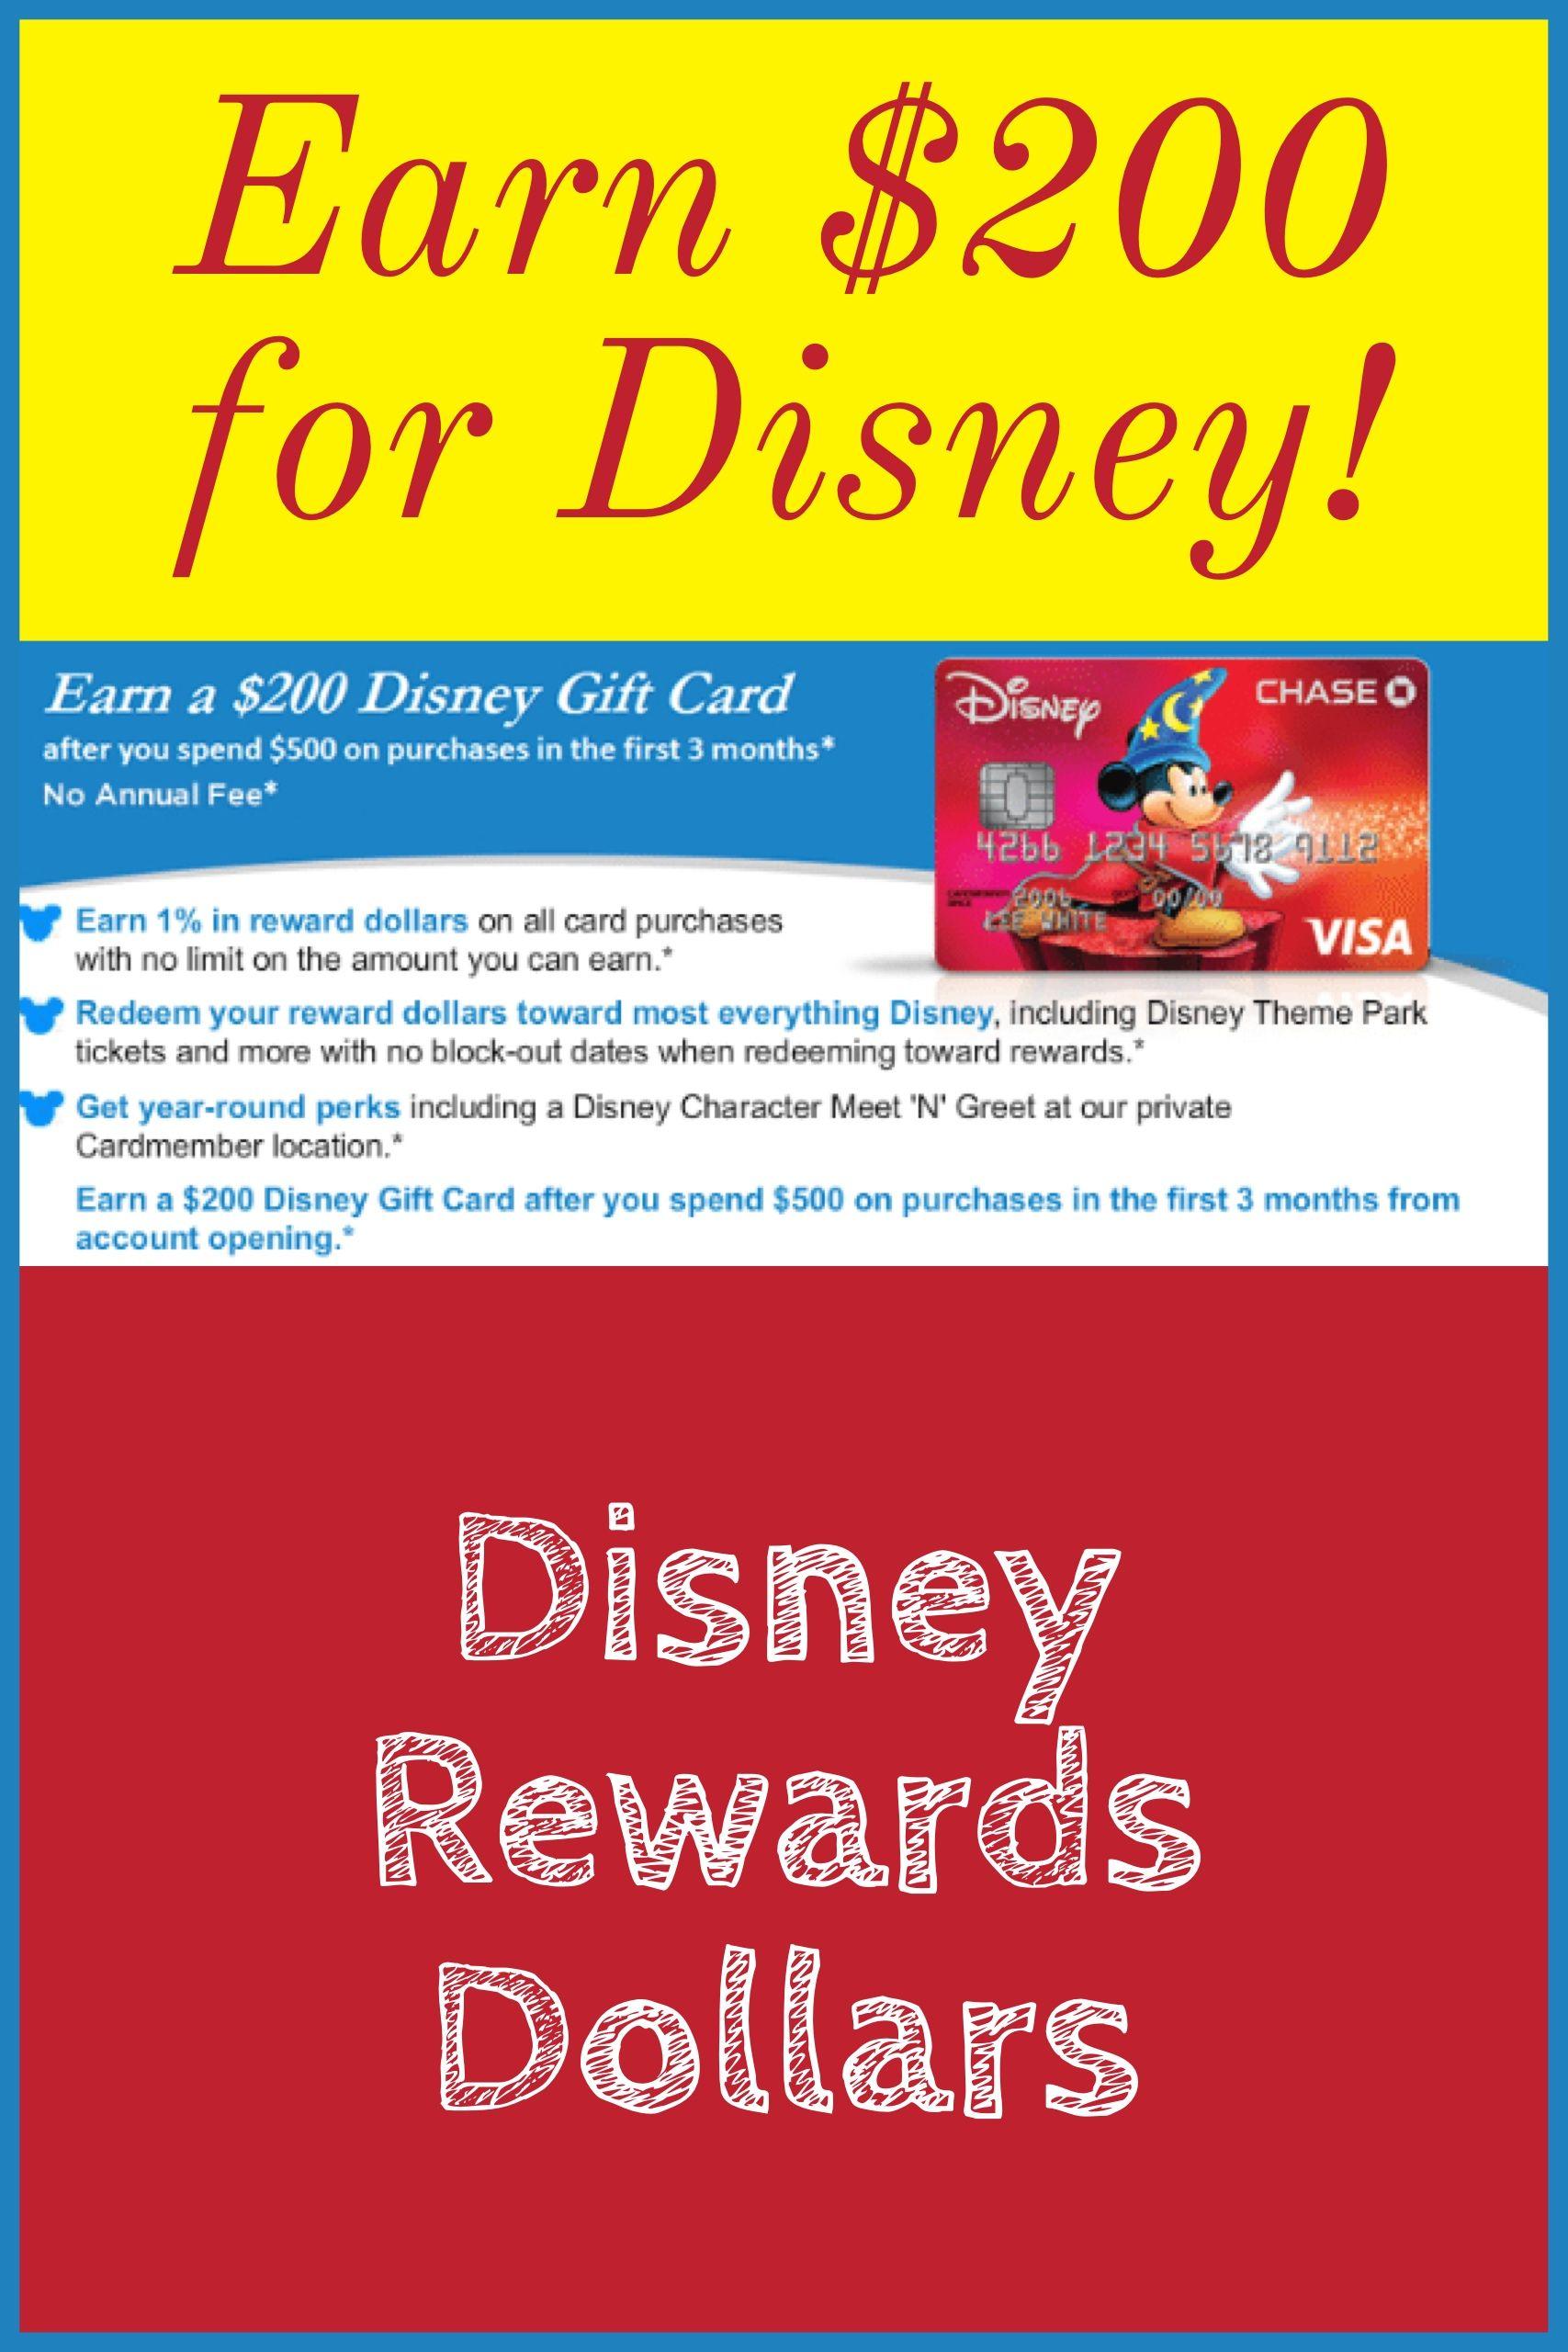 Earn a 200 disney gift card earn a 200 disney gift card